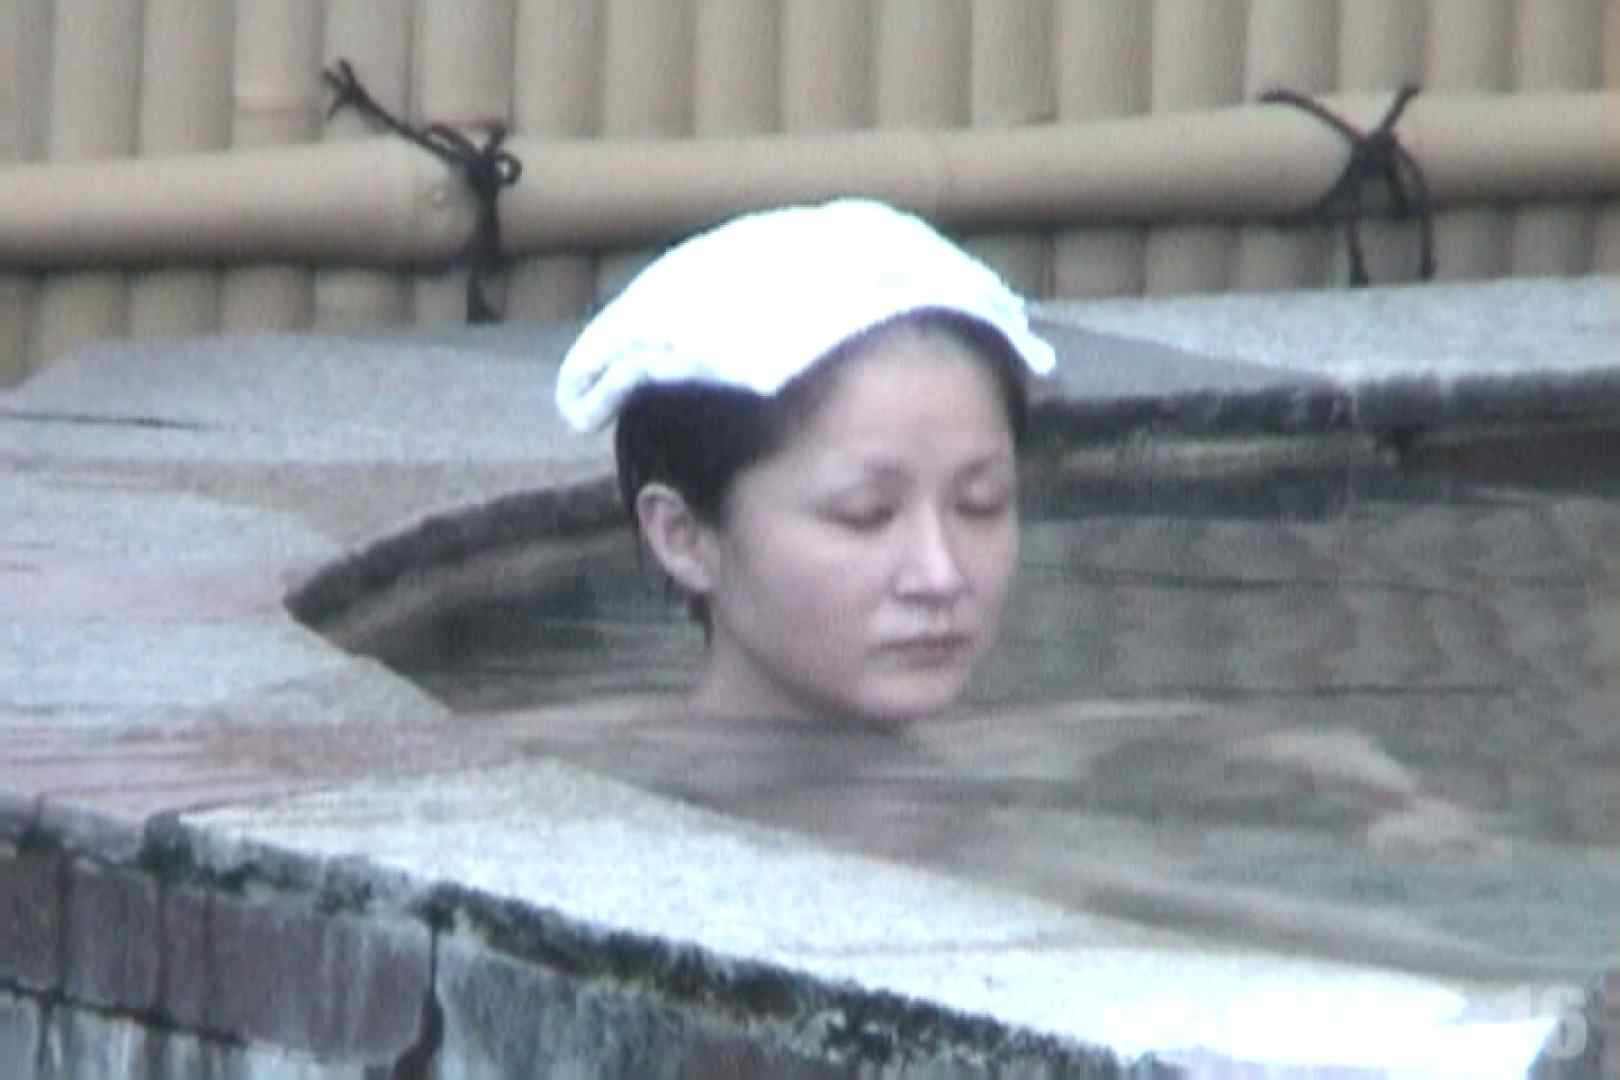 Aquaな露天風呂Vol.845 盗撮  40連発 33